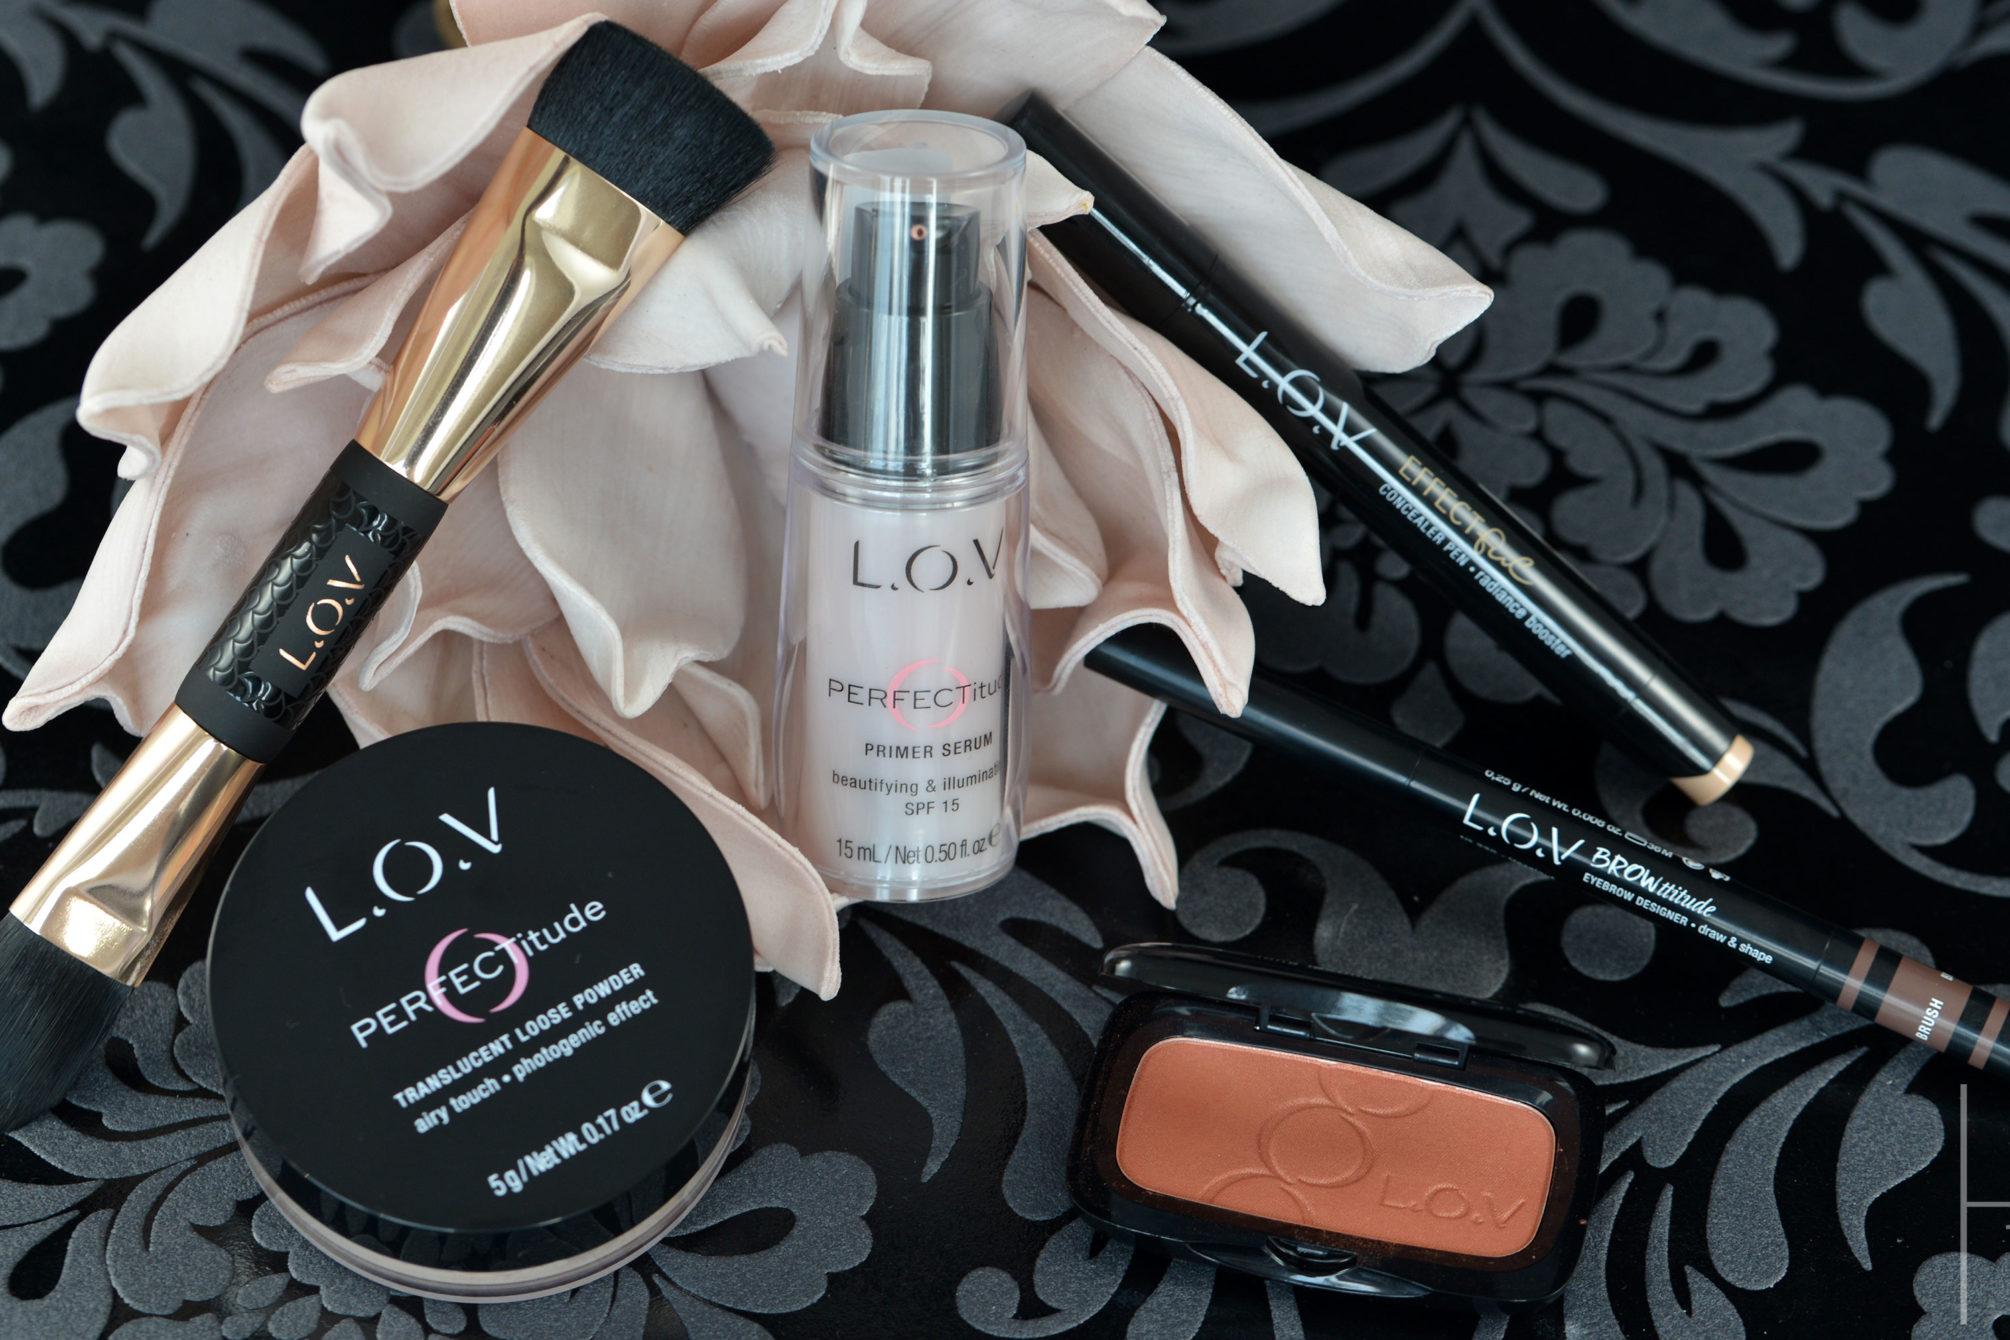 L.O.V Cosmetics by Cosnova